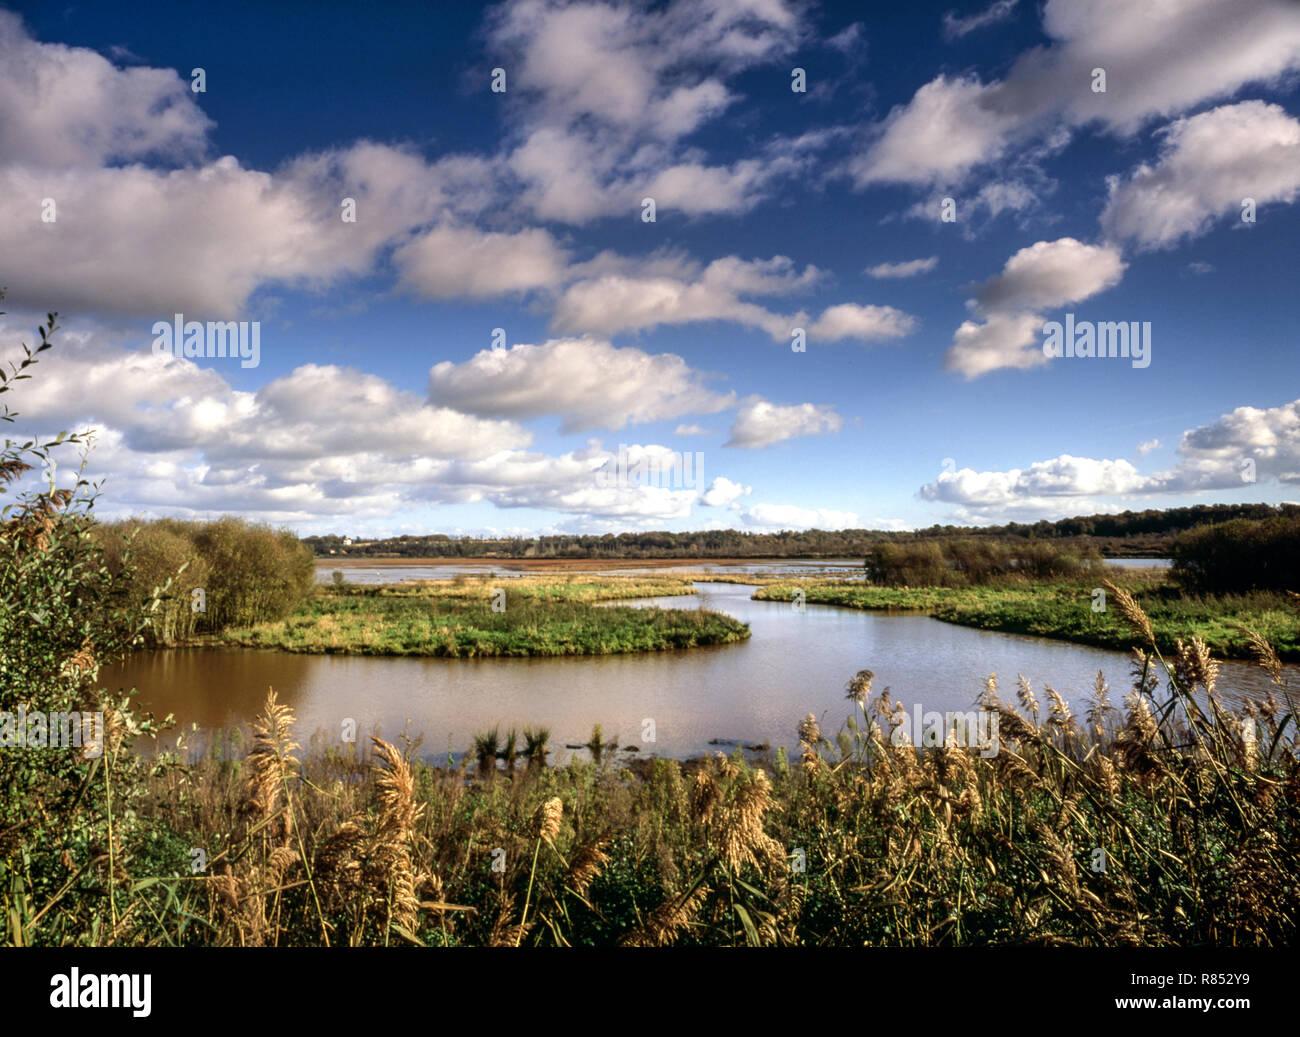 France.Marais D'Orx Nature Reserve on the Atlantic coast near Bayonne. - Stock Image